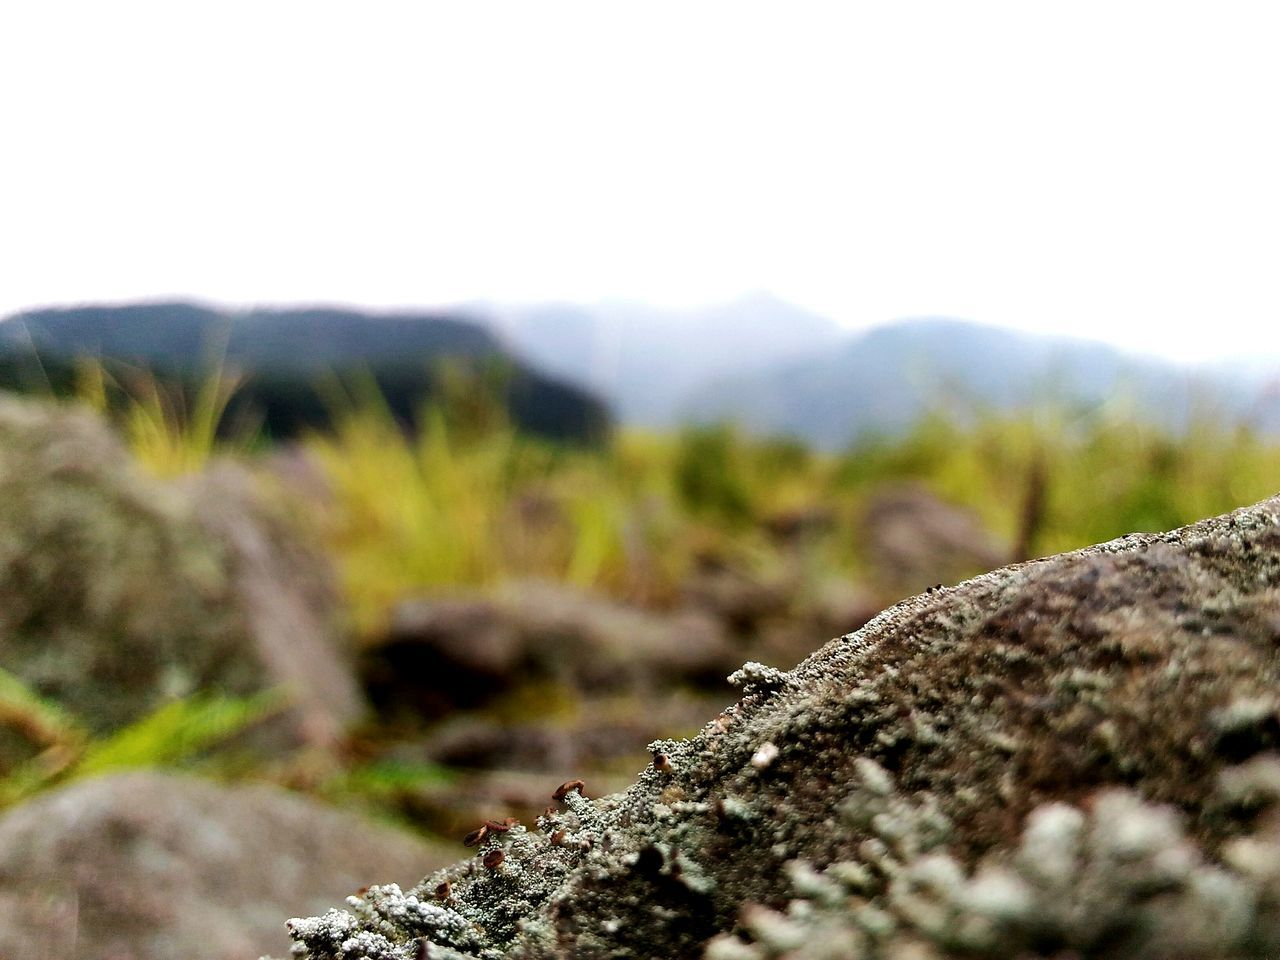 Auto focus part 1 Nature Landscape Outdoors No People Beauty In Nature Mountain Merapimountain Merapi Yogyakarta Traveling Adventure Nature DiscoverIndonesia INDONESIA PhonePhotography Photooftheday Photography Explore Jawatengah Autofocus